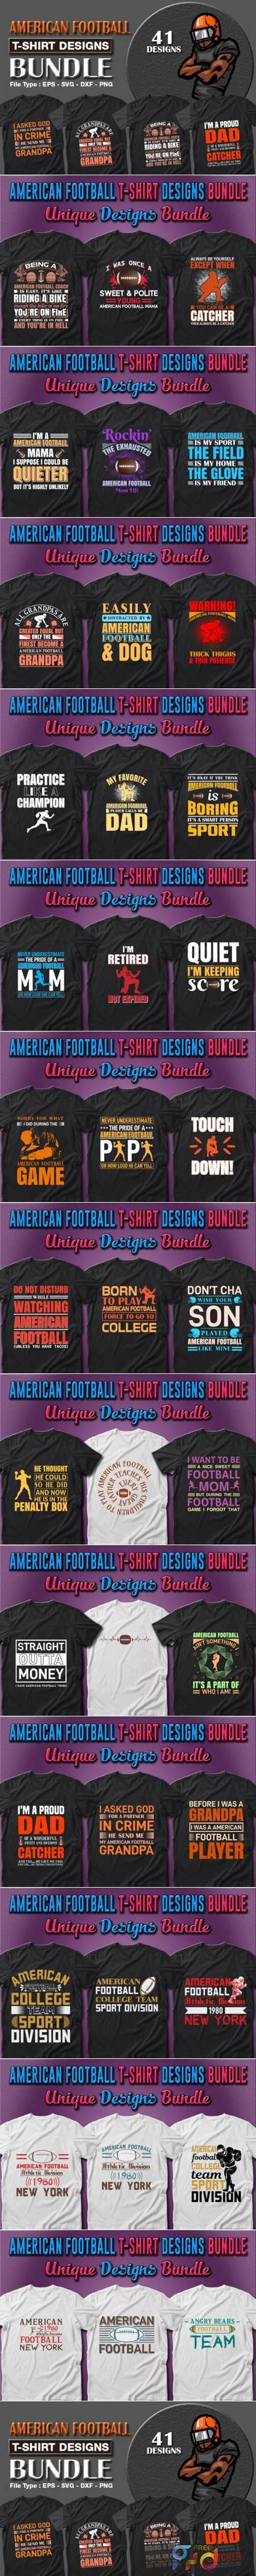 American Football T-shirt Designs Bundle 7157949 1